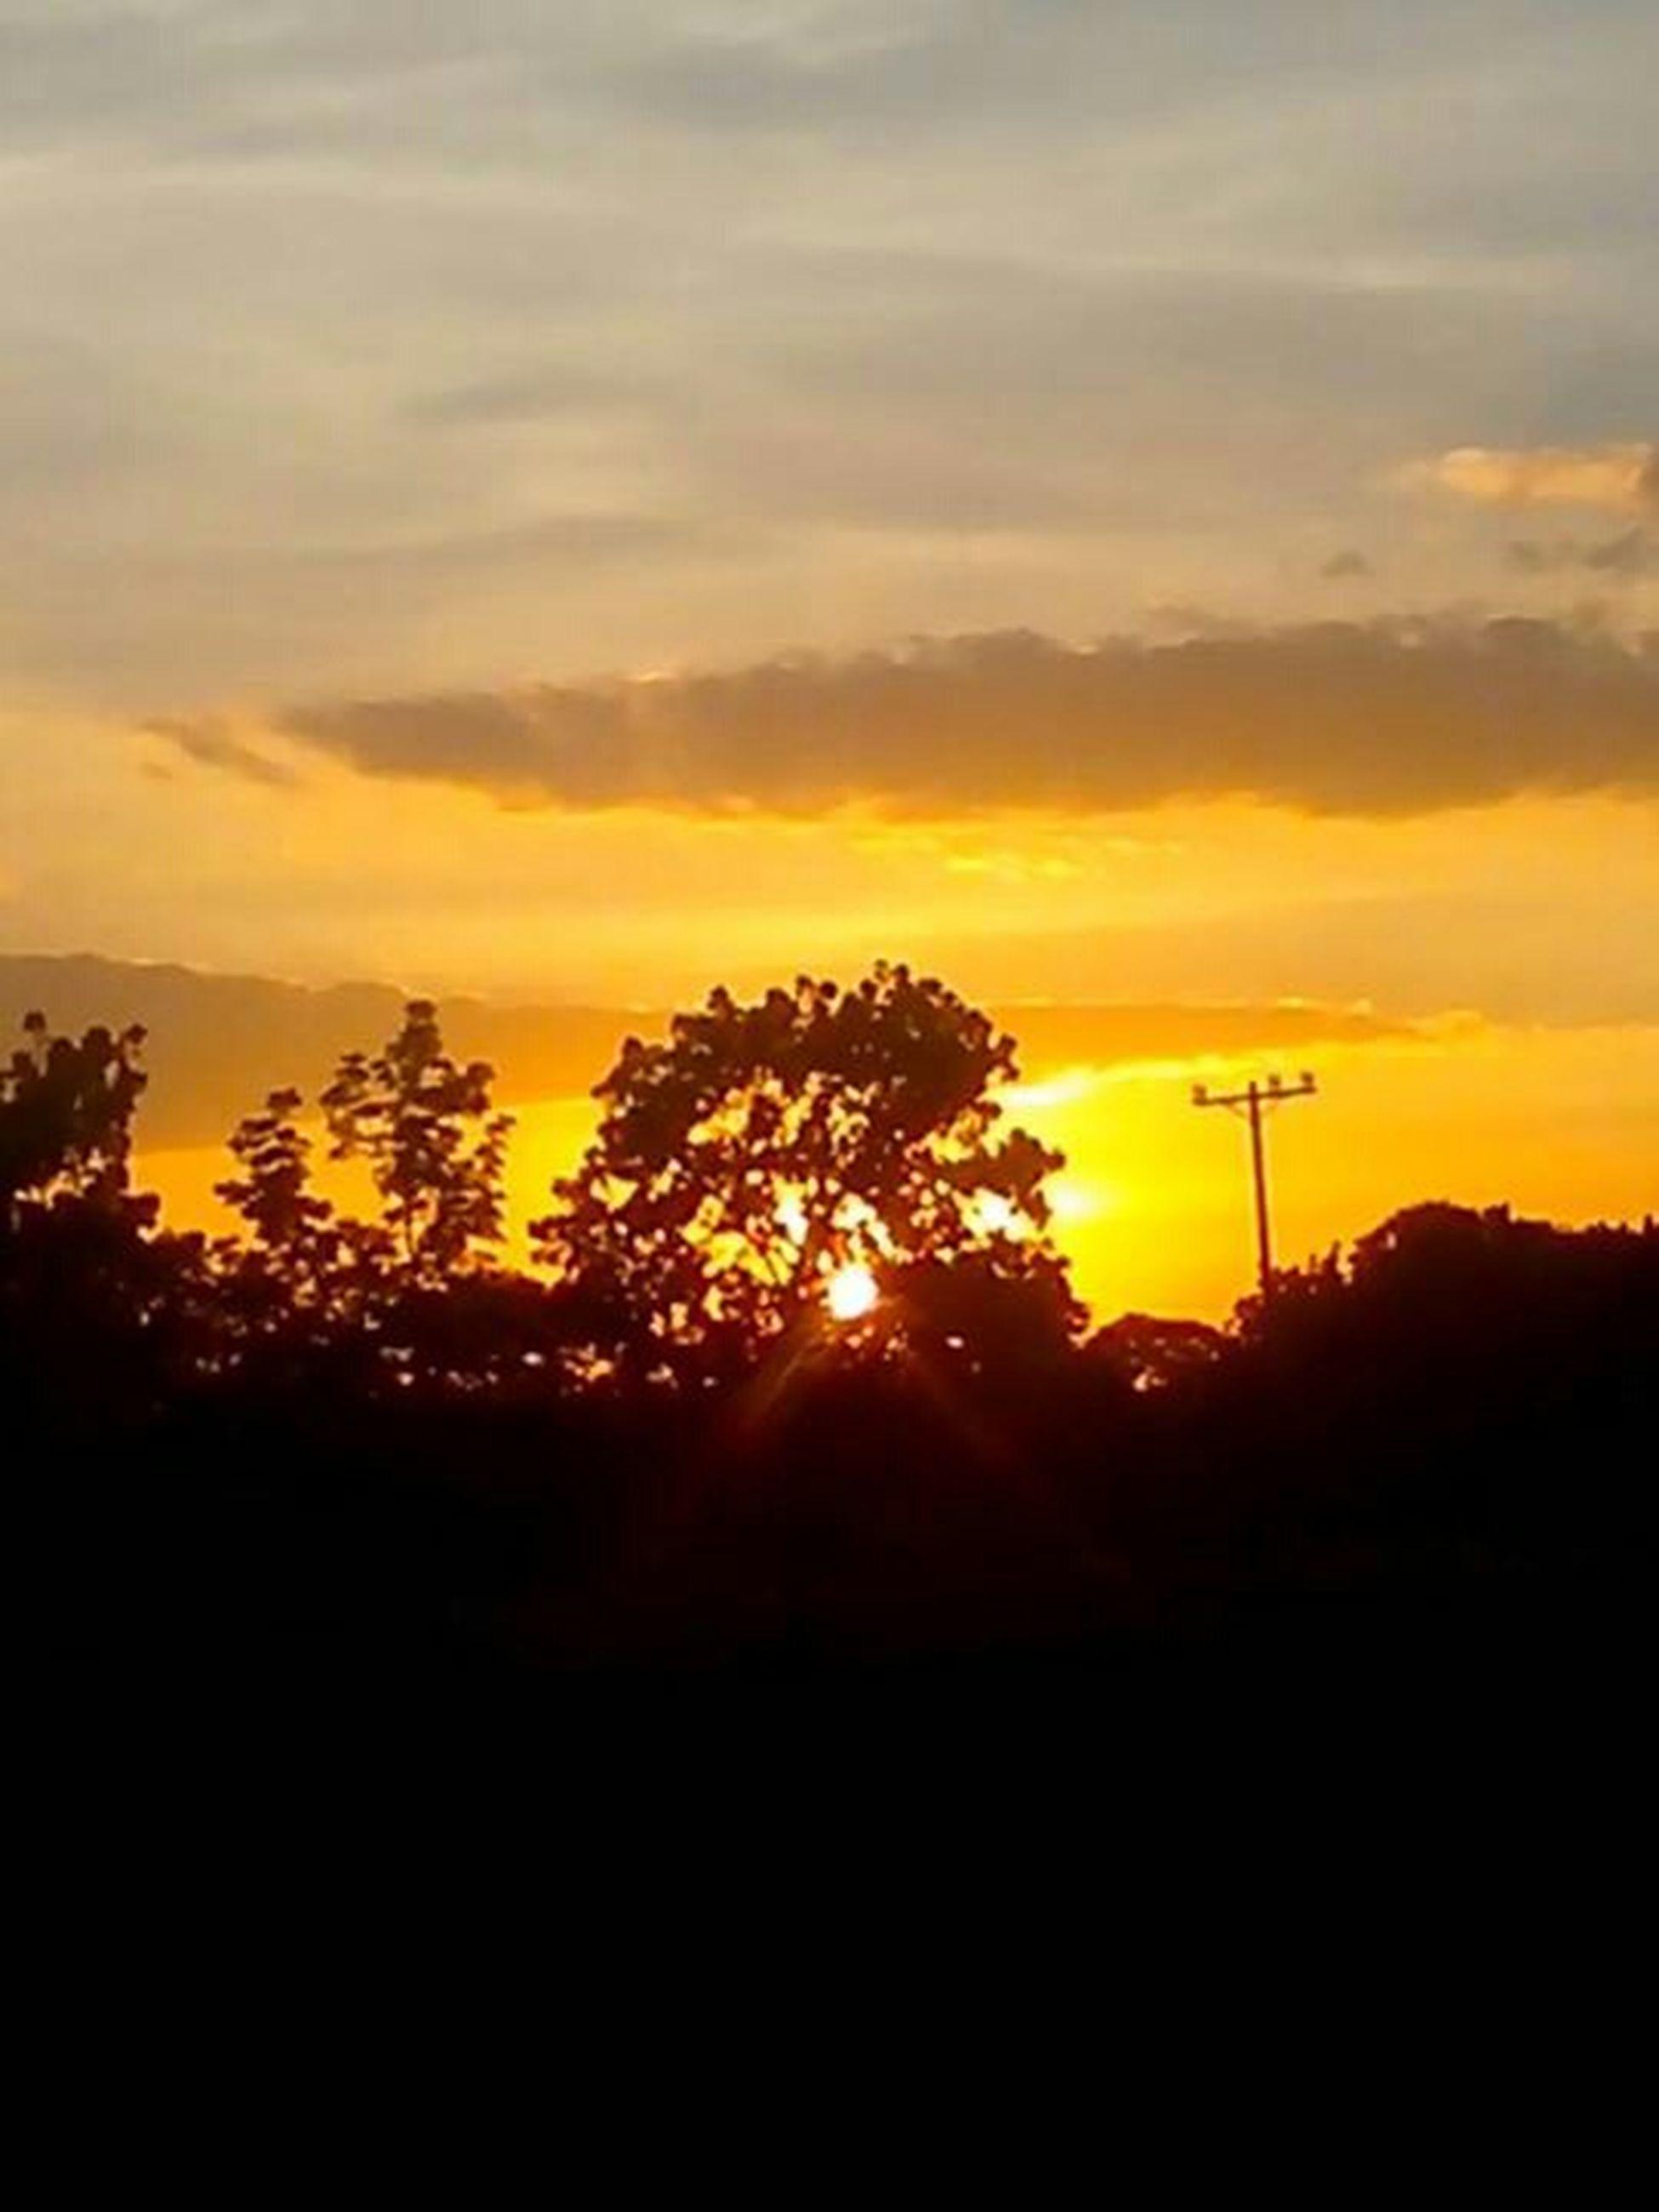 sunset, silhouette, orange color, sky, beauty in nature, tree, scenics, tranquility, tranquil scene, cloud - sky, nature, idyllic, landscape, cloud, dark, sun, dramatic sky, outdoors, no people, outline